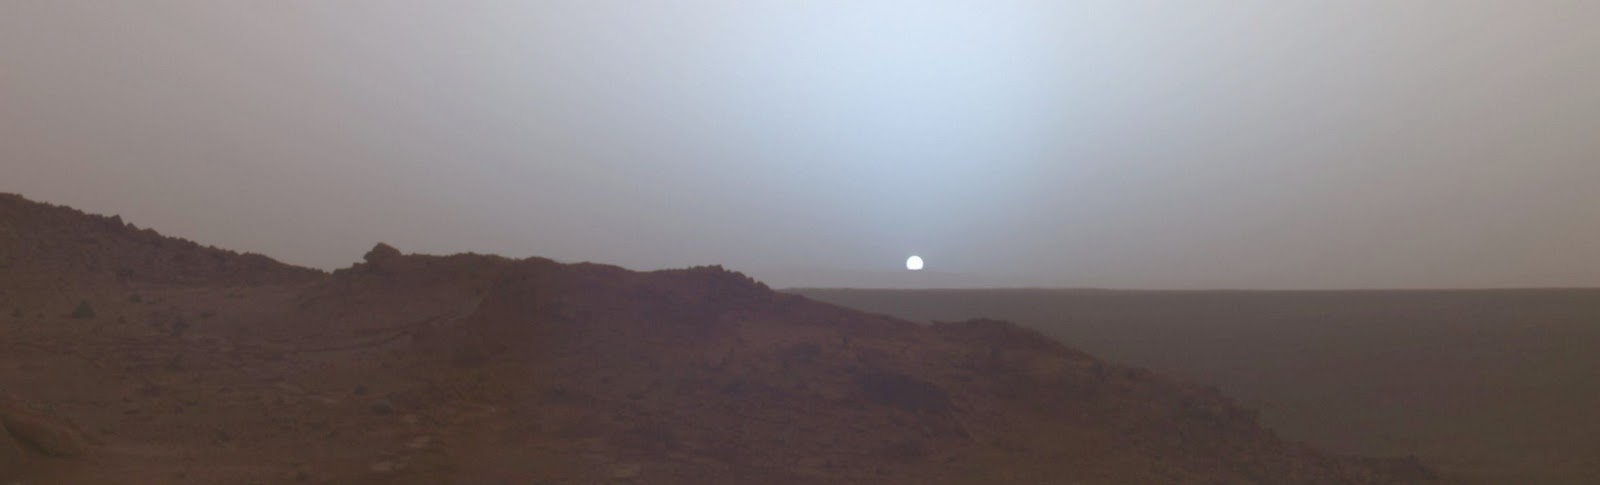 mars sunset rover - photo #21